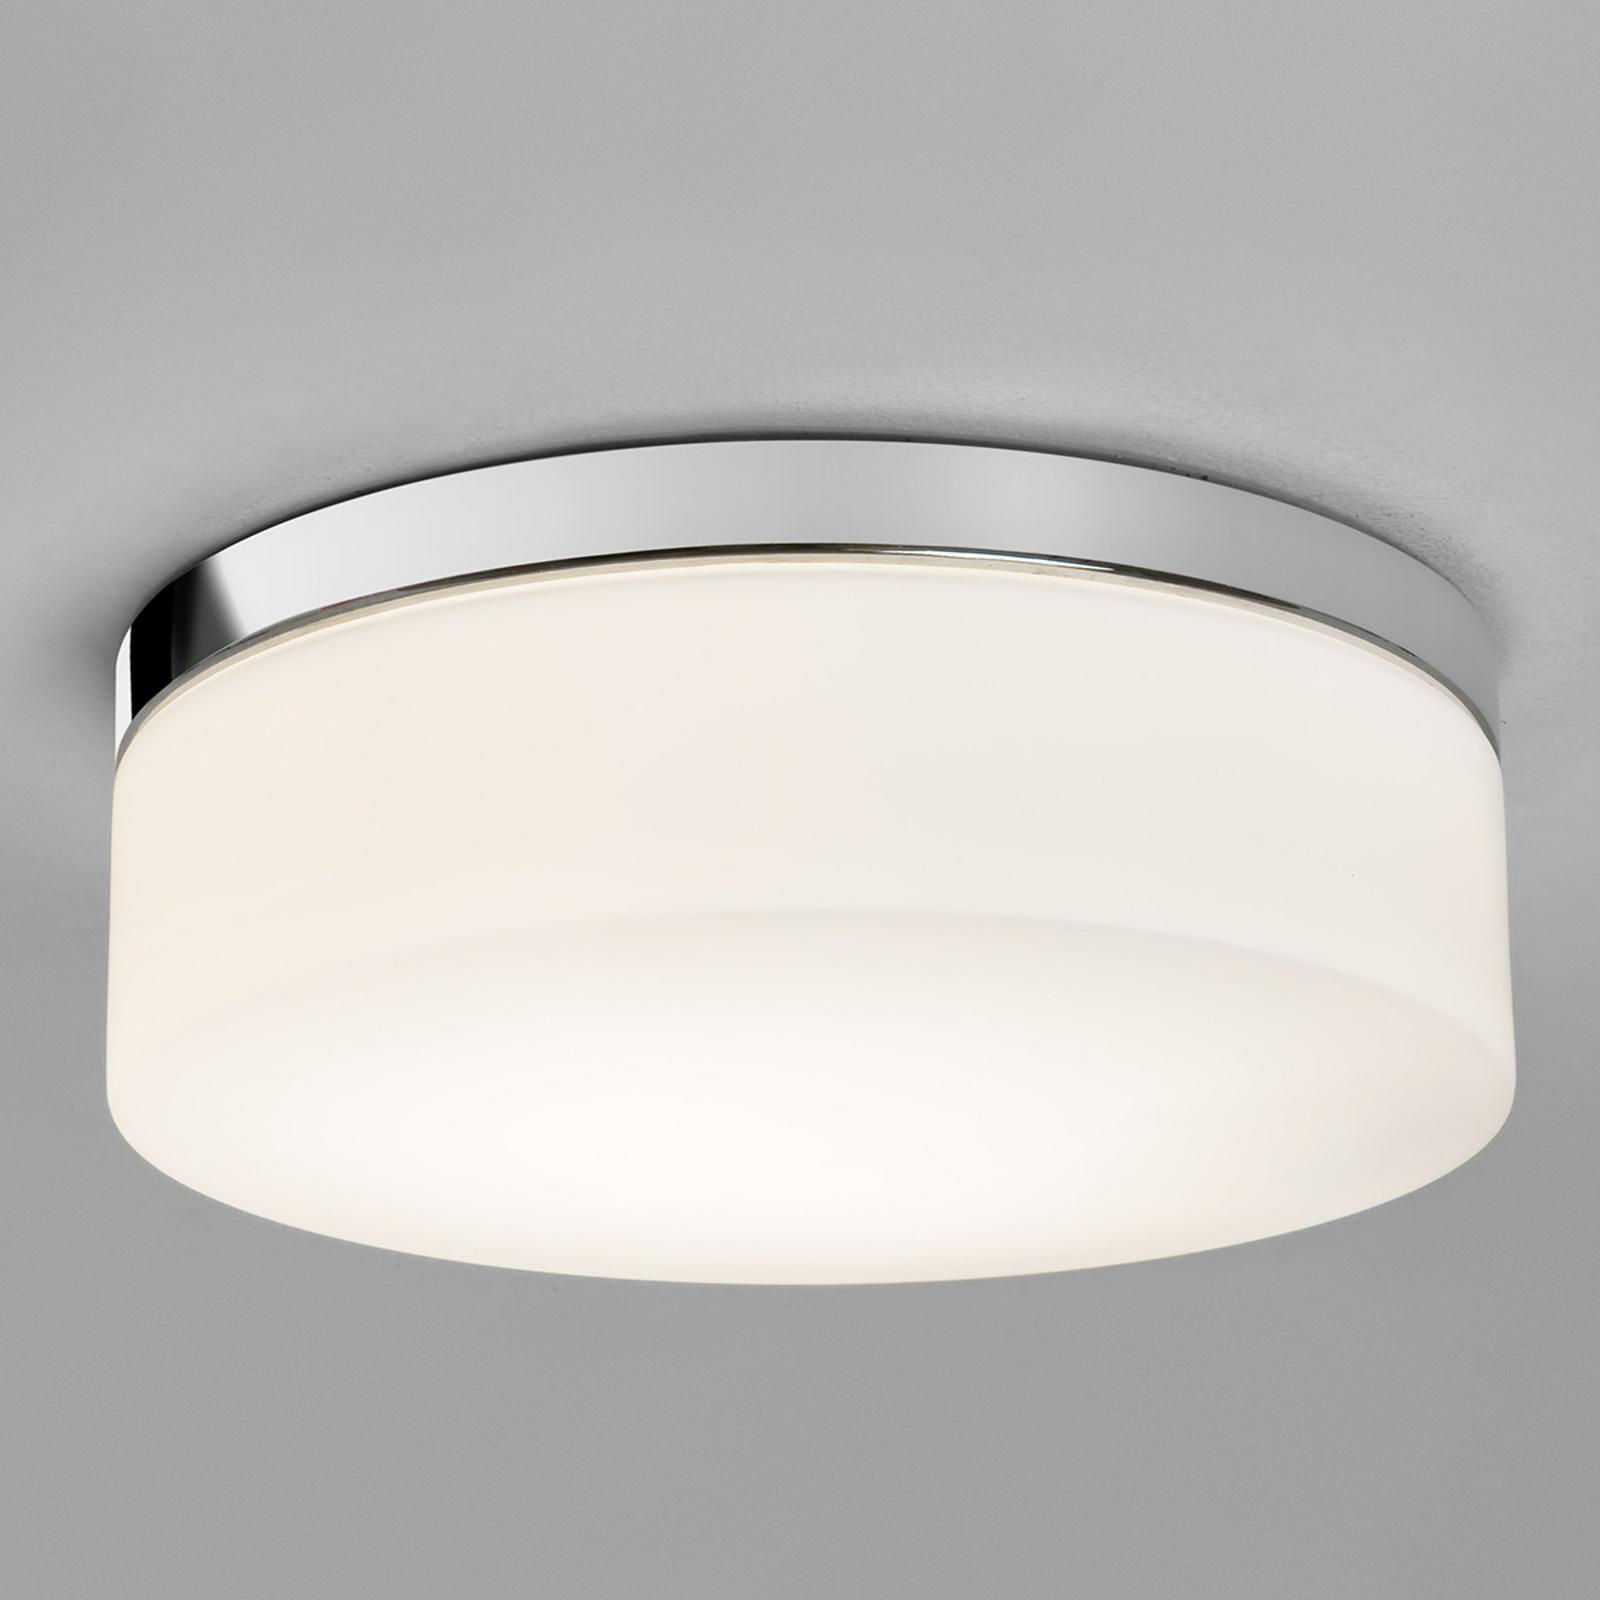 Ronde badkamer-plafondlamp Sabina 280